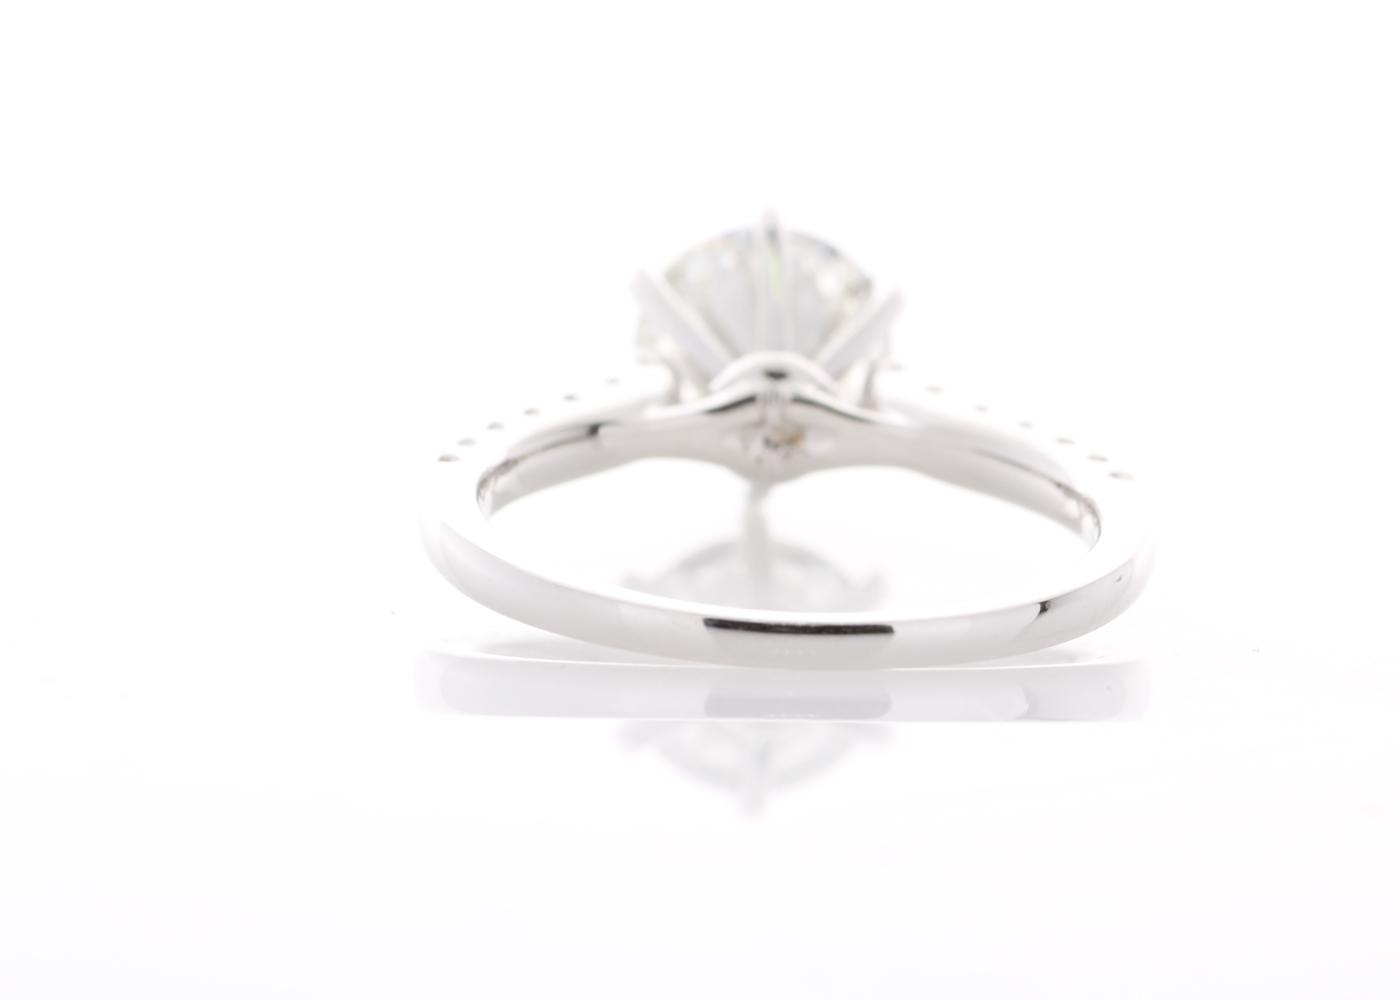 Lot 23 - 18ct White Gold Single Stone Prong Set With Stone Set Shoulders Diamond Ring (1.56) 1.85 Carats